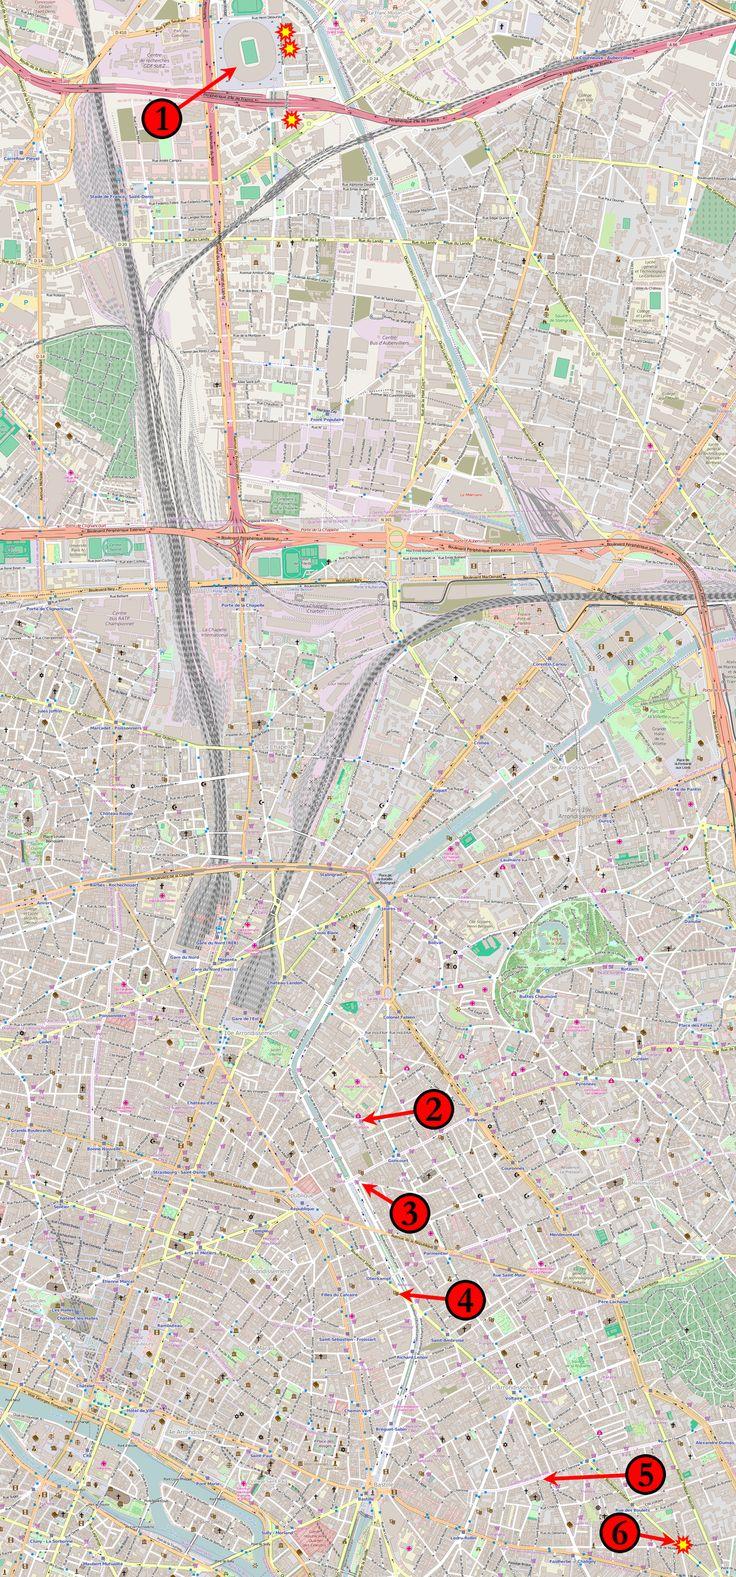 November 2015 Paris attacks - Wikipedia